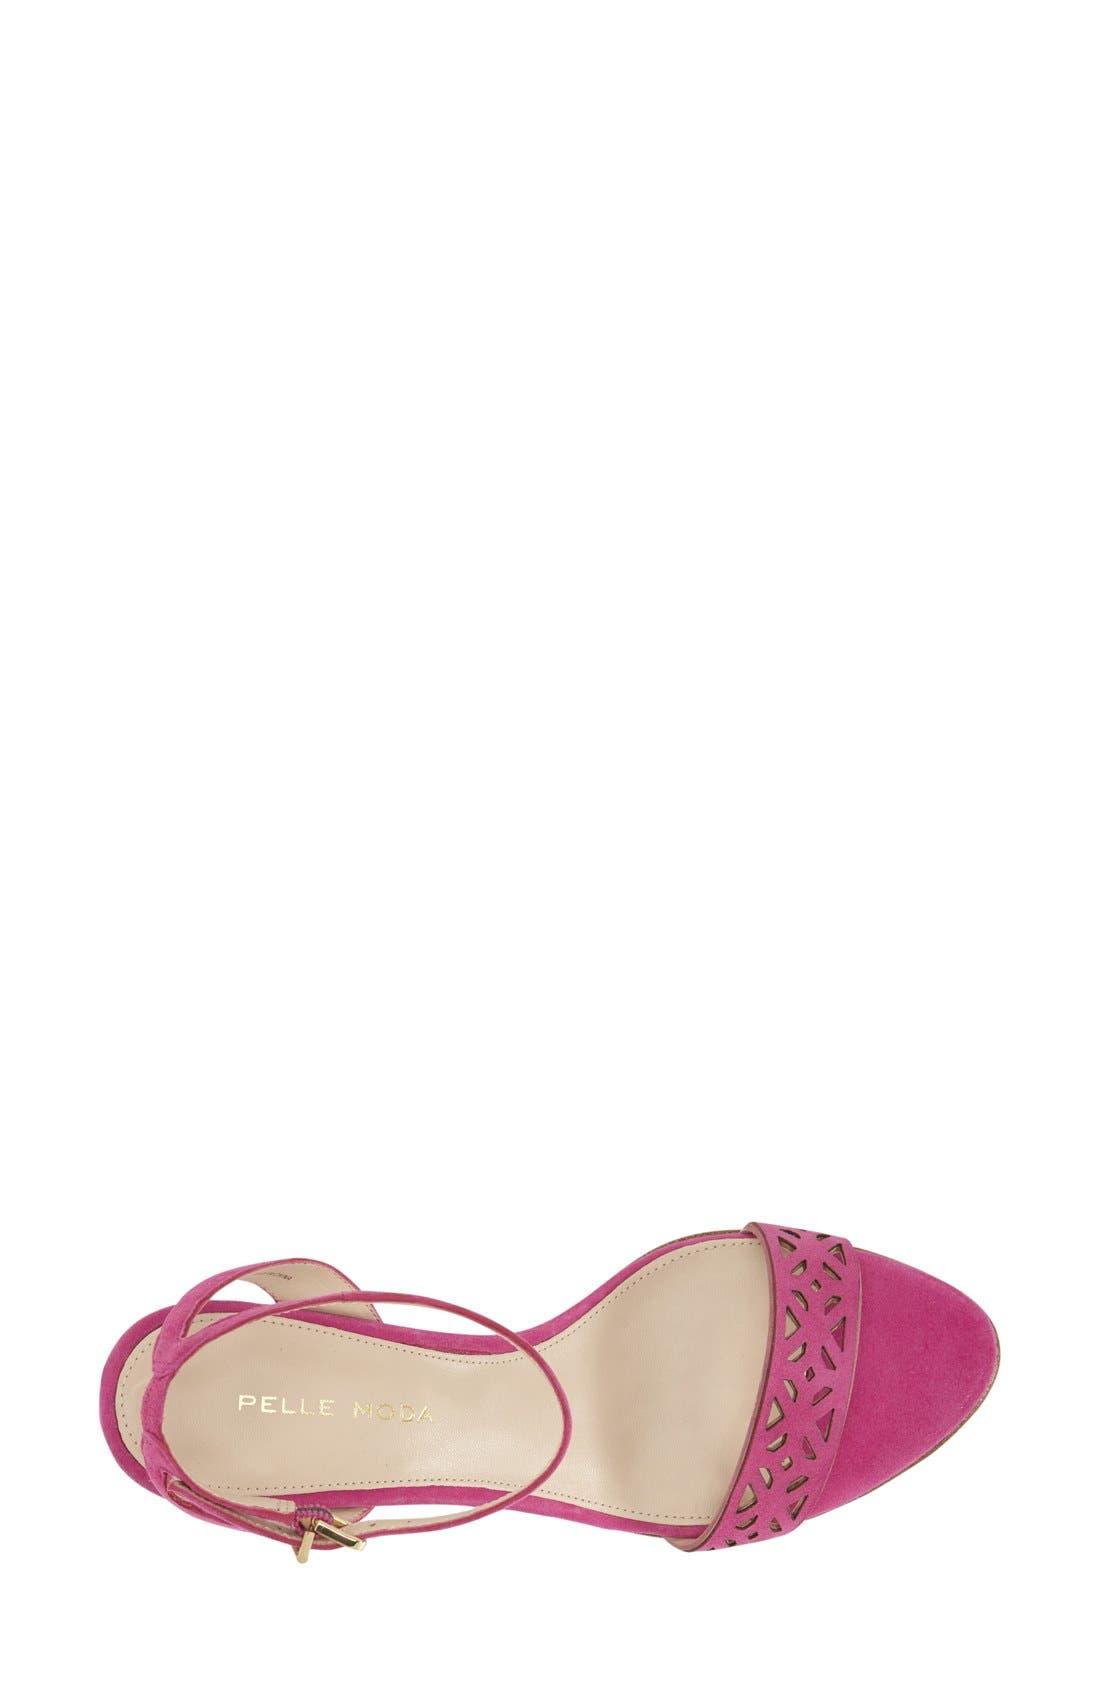 'Otis' Ankle Strap Sandal,                             Alternate thumbnail 3, color,                             Sugarplum